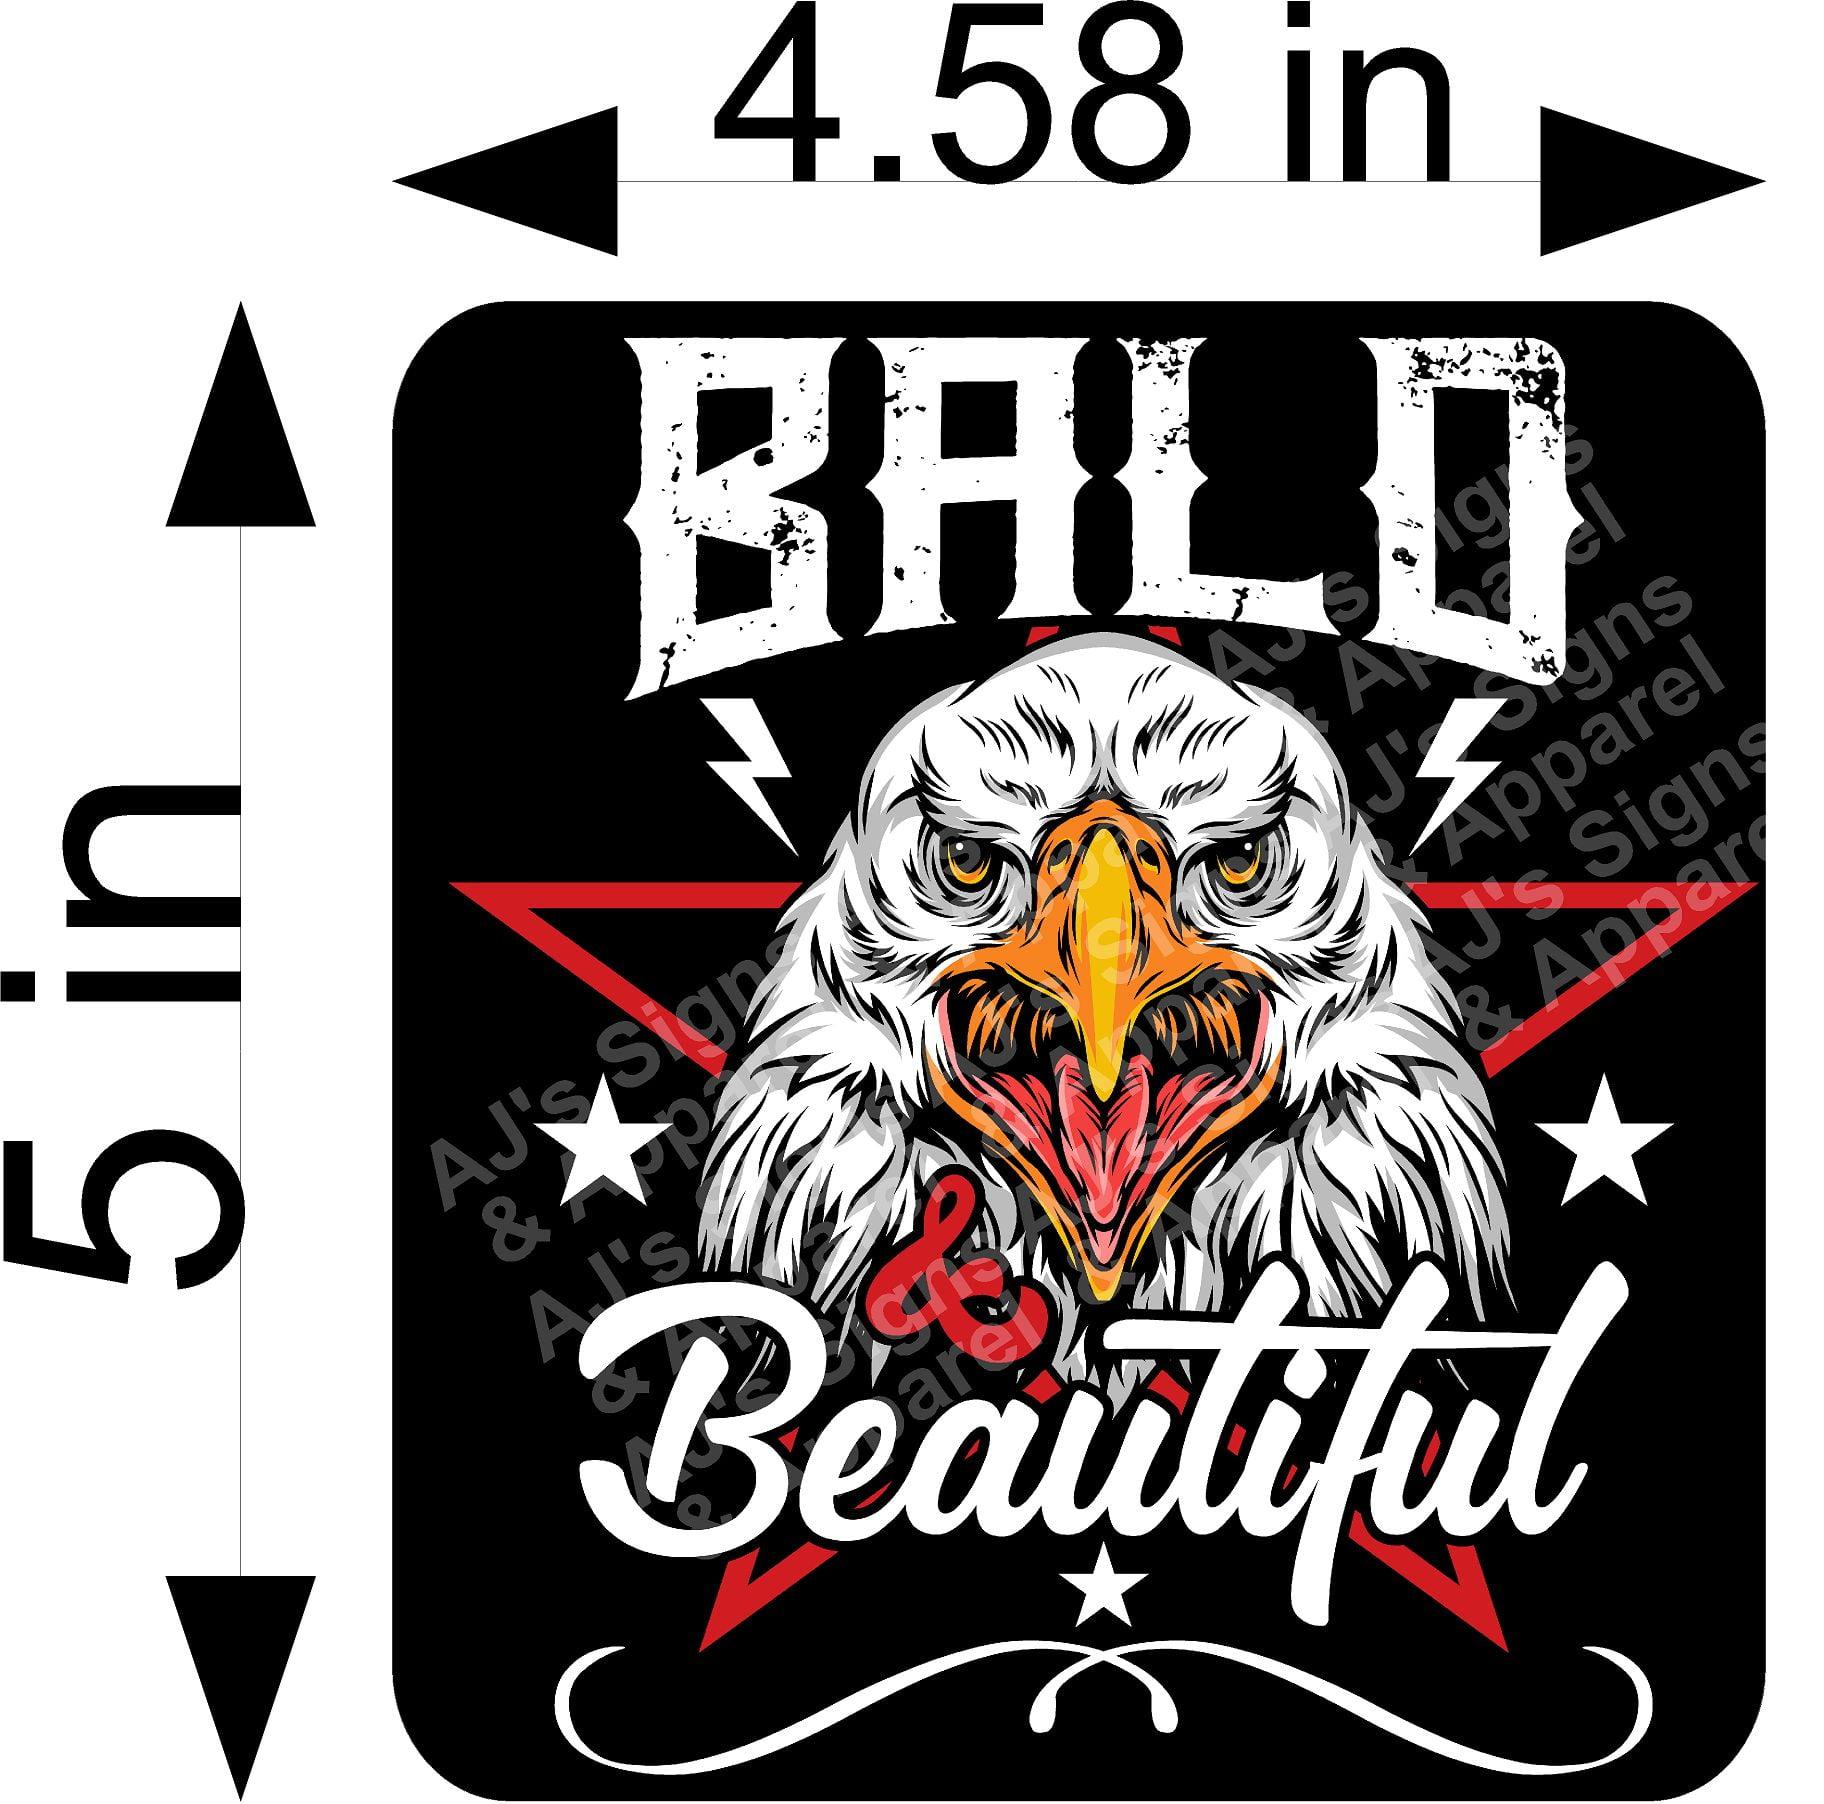 Bald Is Beautiful Sticker